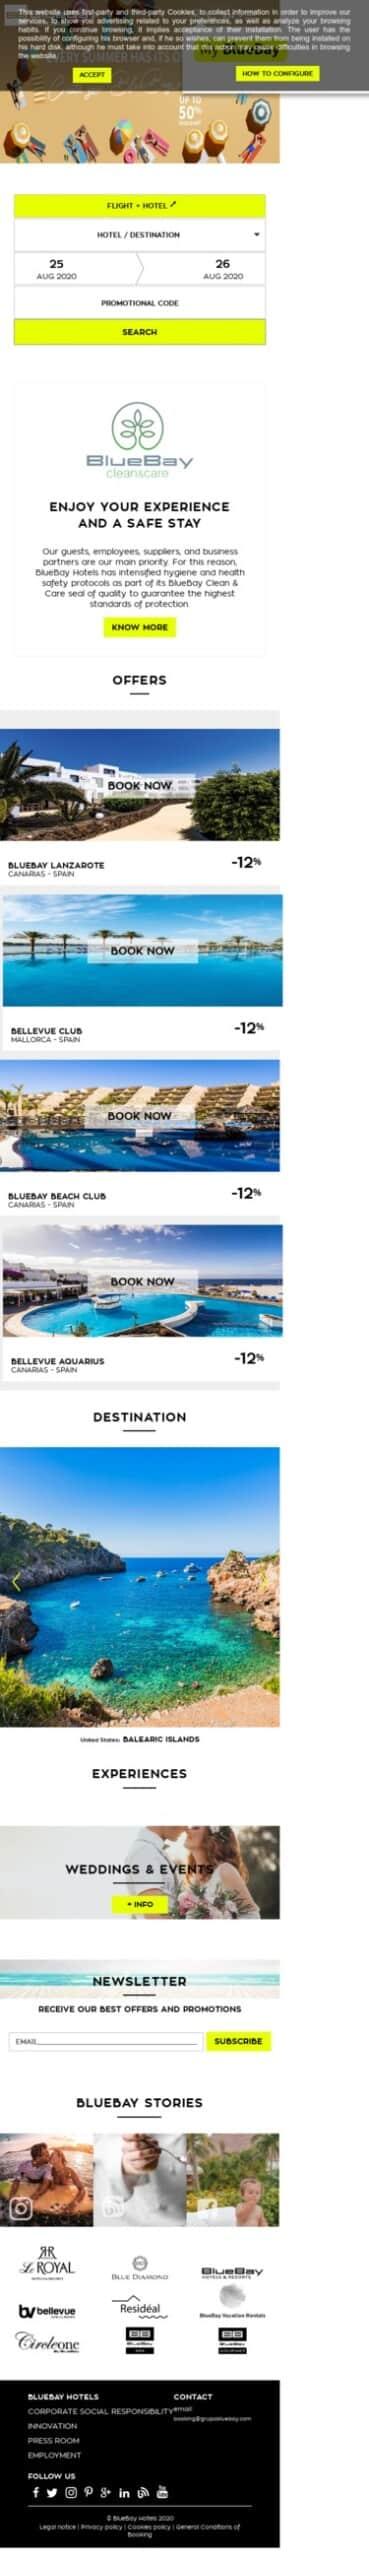 blue bay resorts Coupon